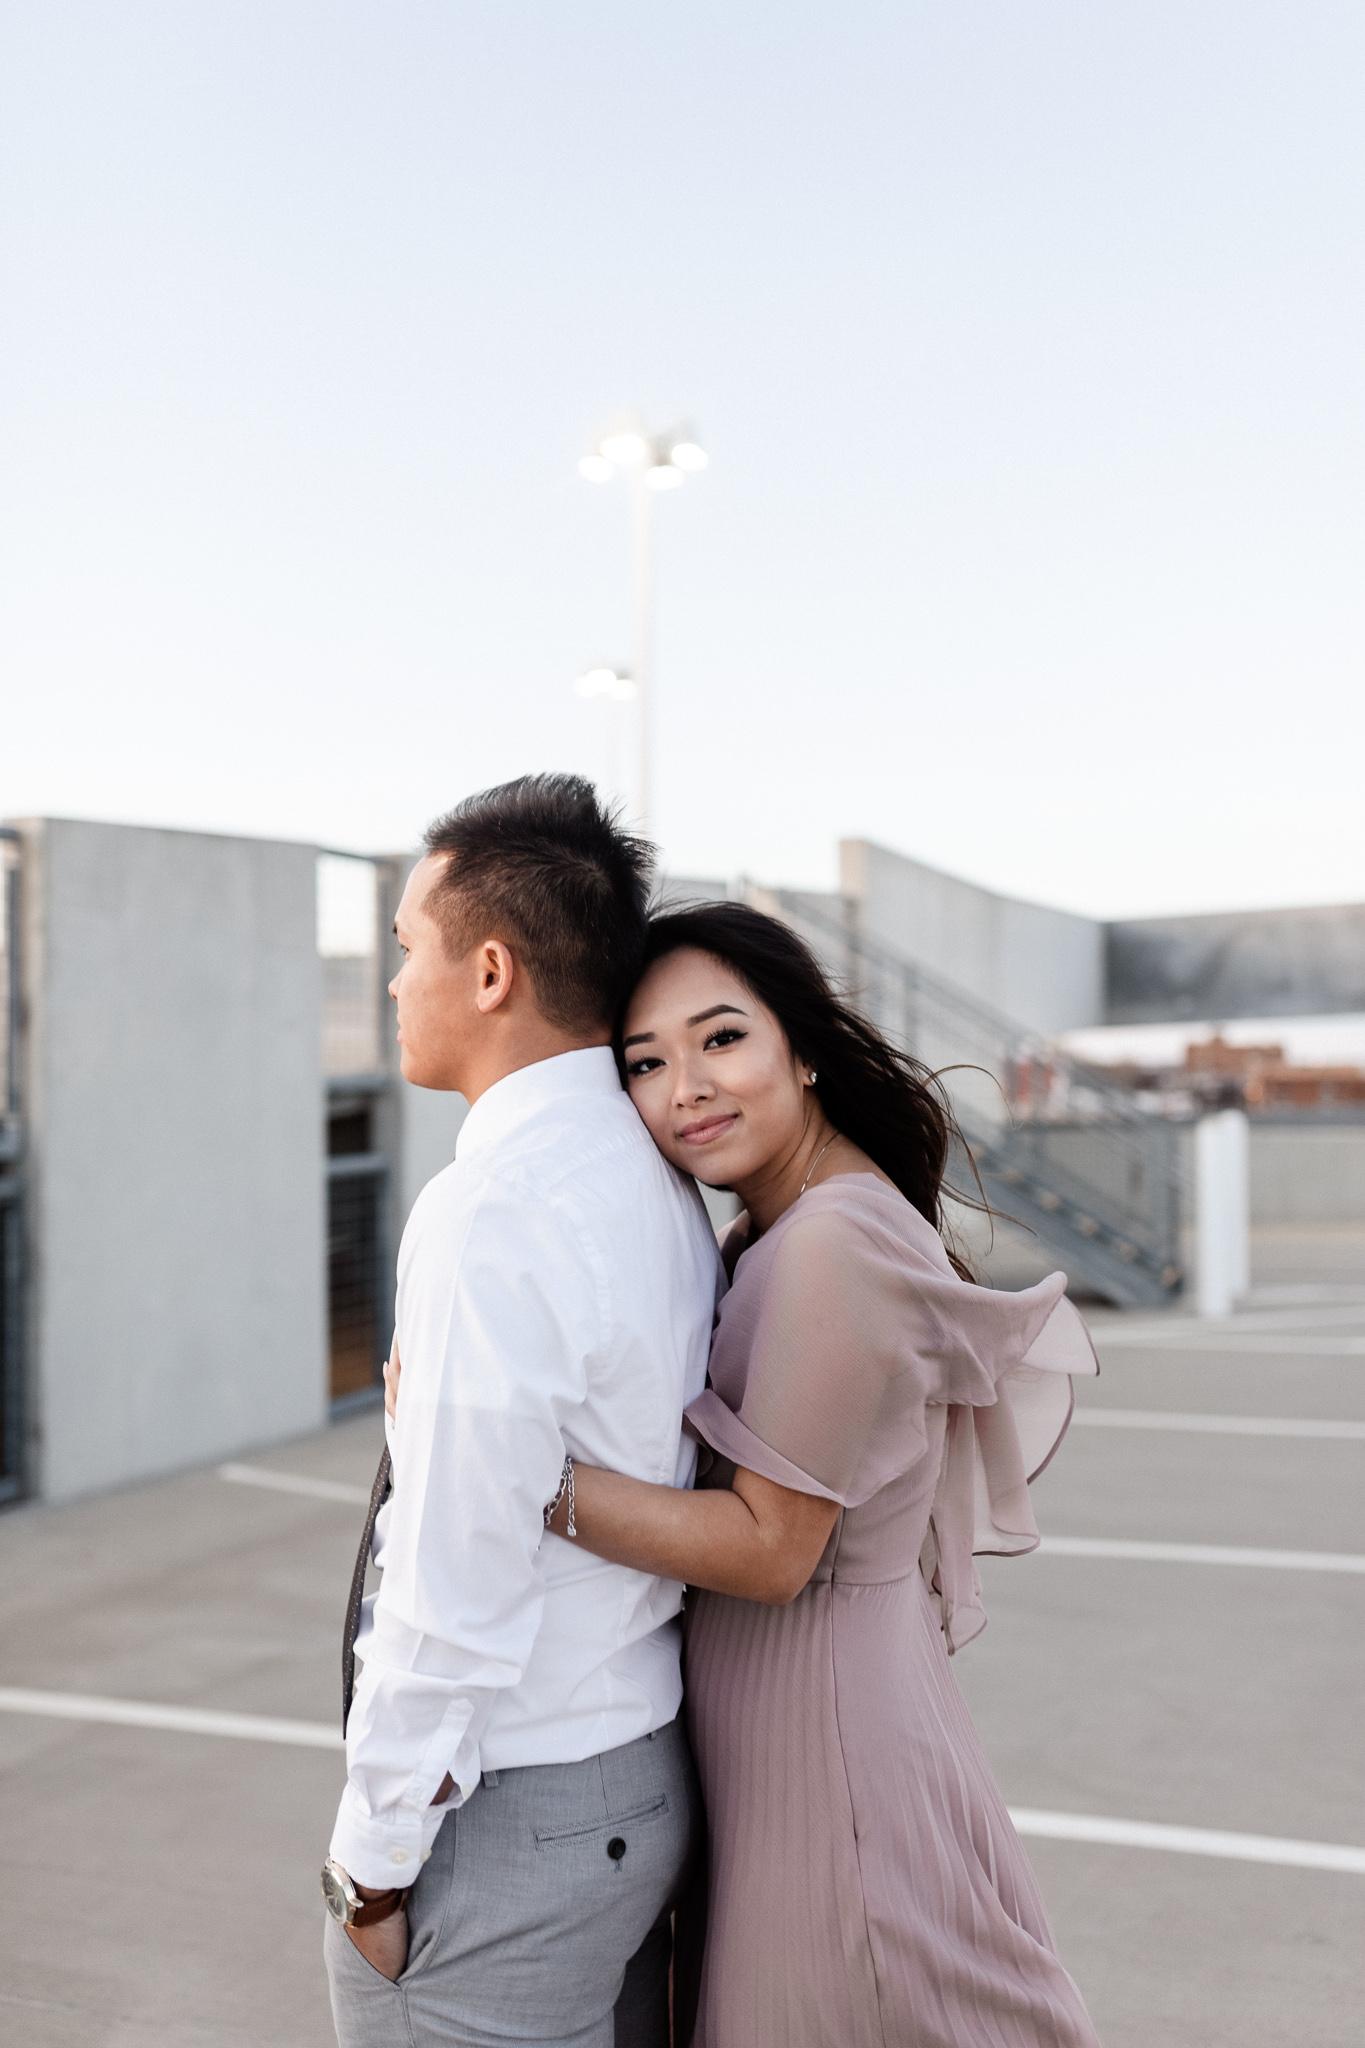 Hieu + Teresa | Colorful Romantic Downtown Engagements | Oklahoma Wedding Photographer-68.jpg